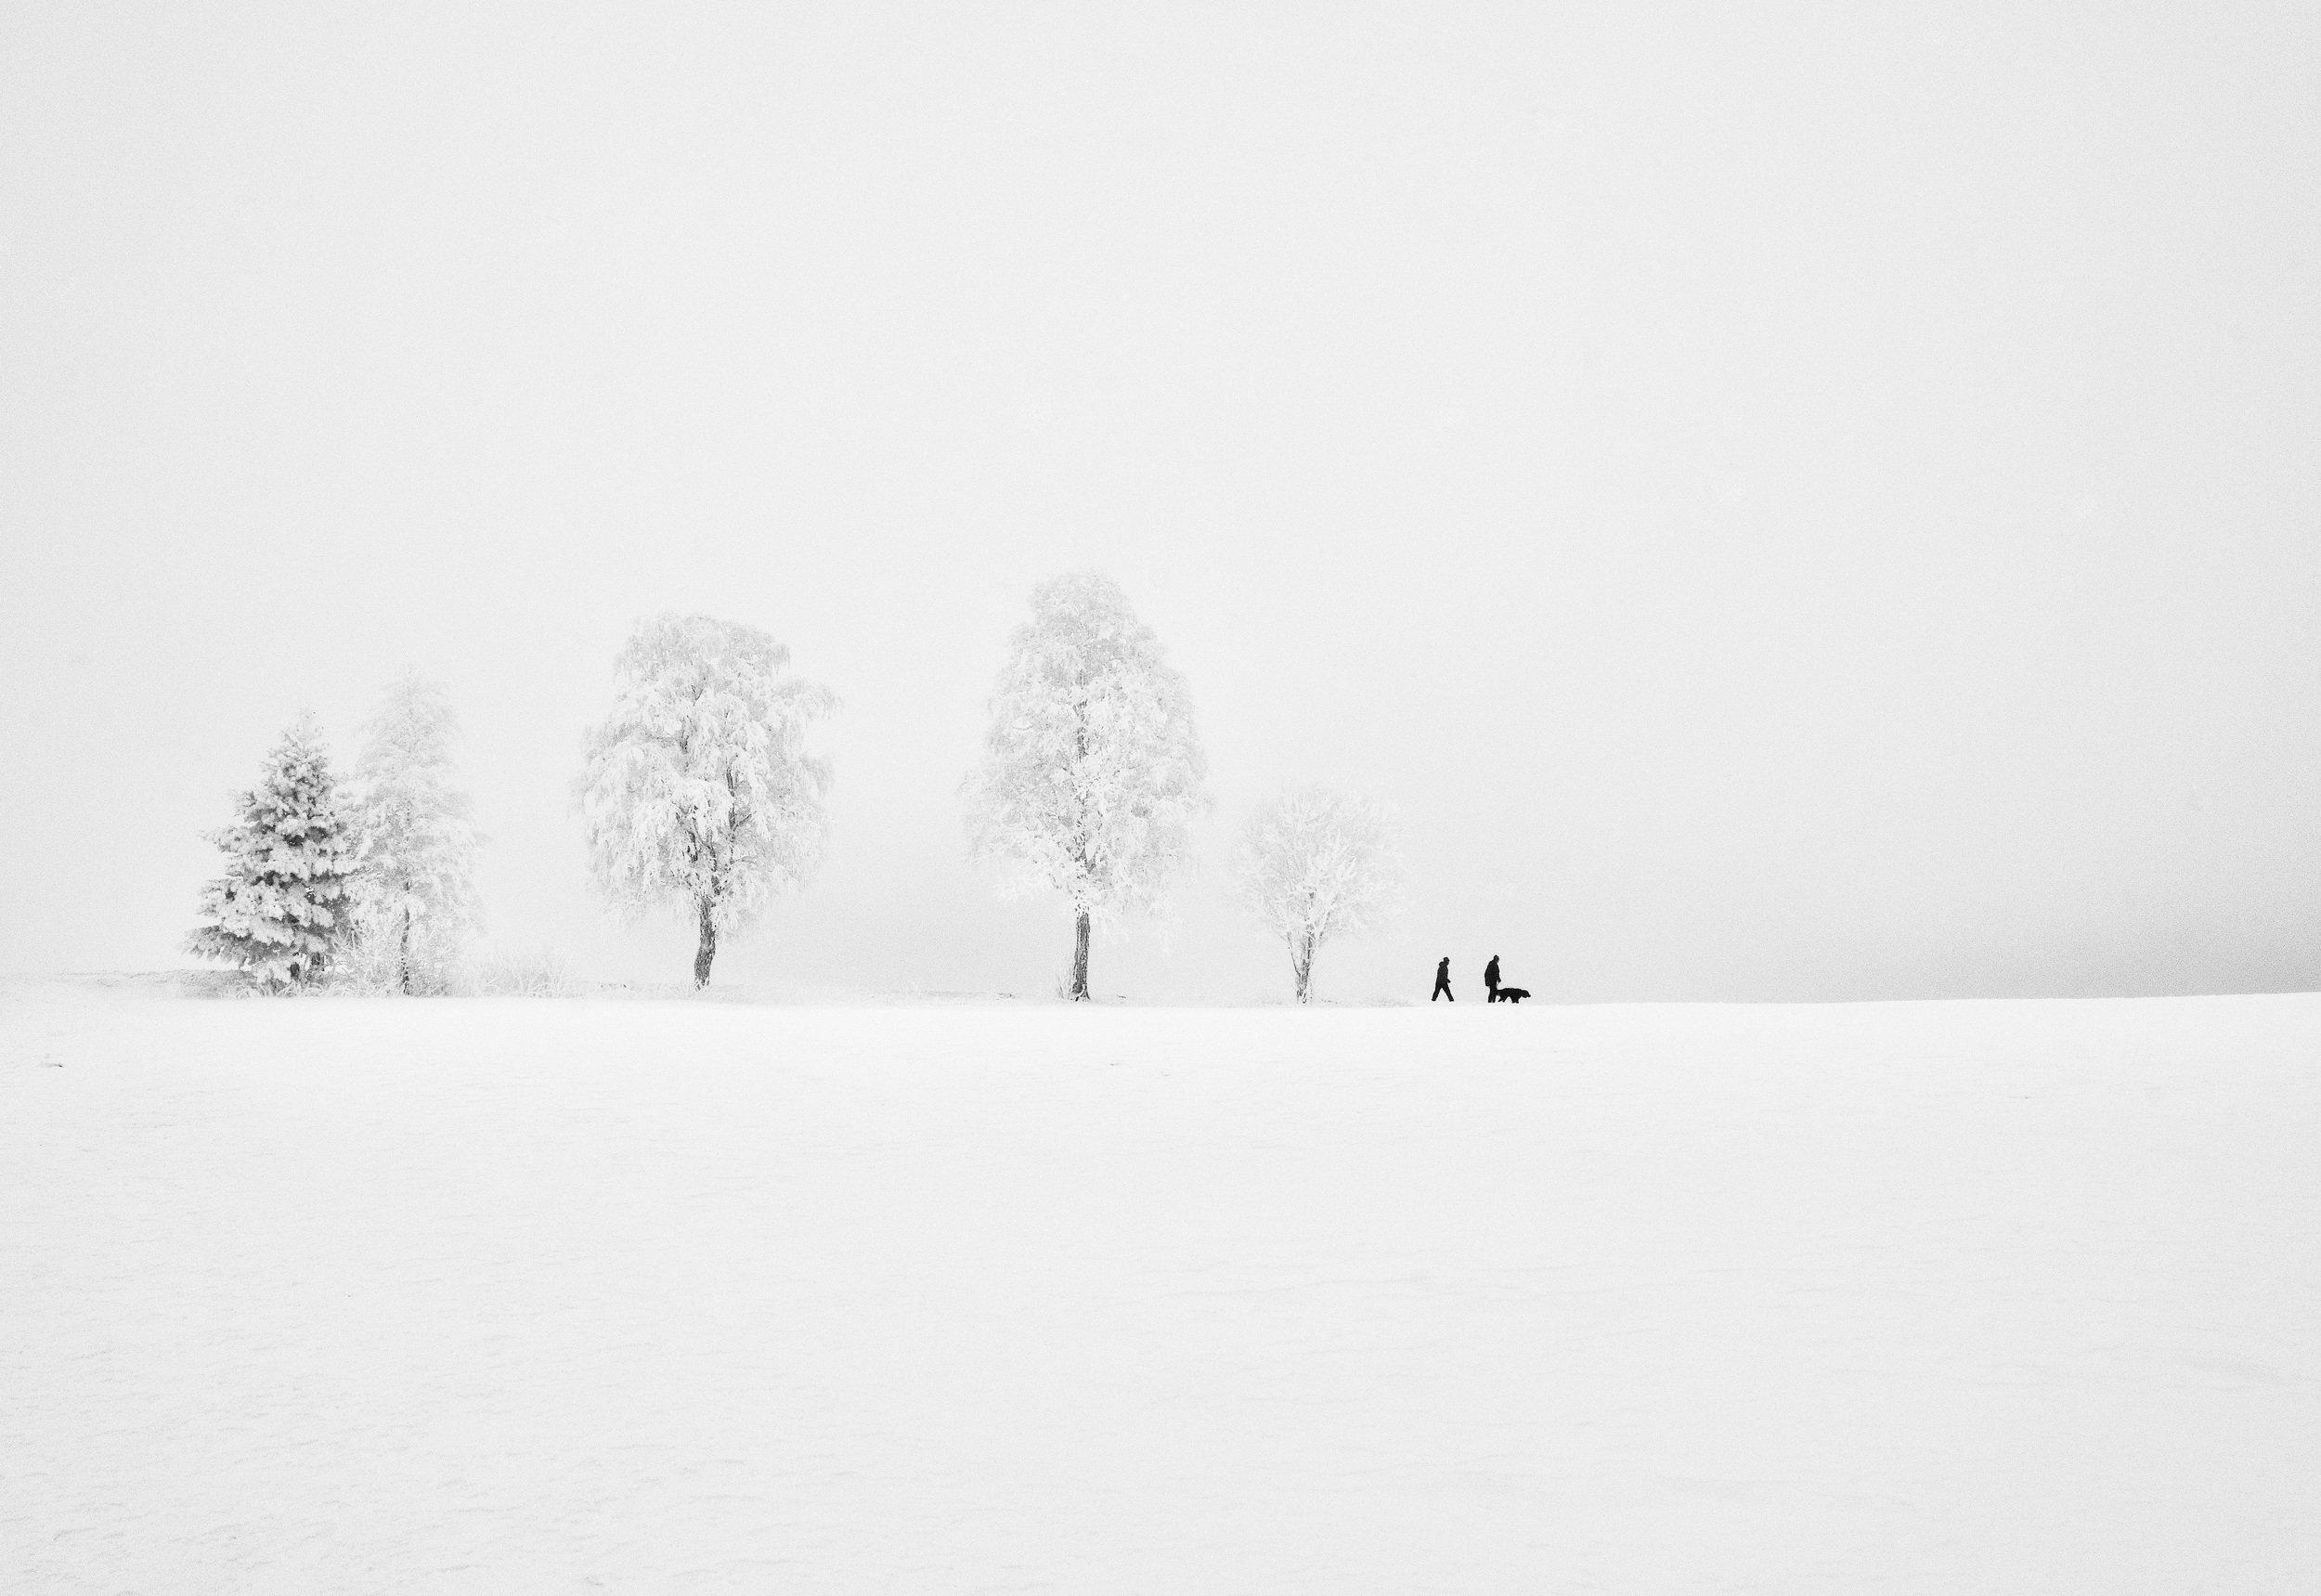 Black & White, winter, people, animals, dog, walk, trees, frost, cold, Norway, white, snow, , Povarova Ree Svetlana